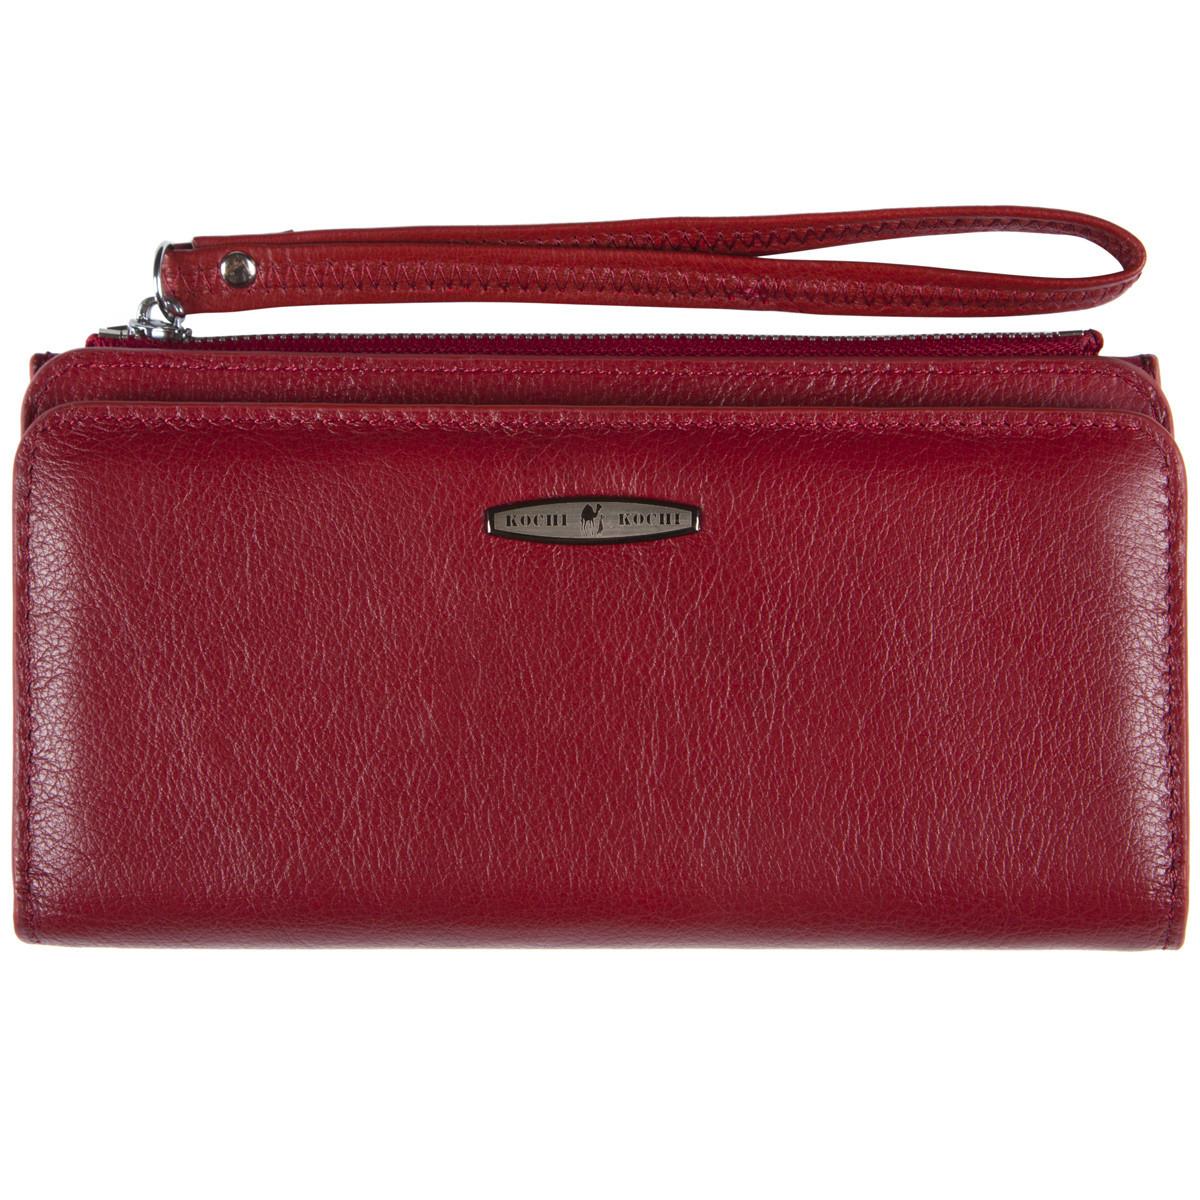 Жіночий клатч-гаманець KOCHI Бордовий (м К6838-Н09бор)